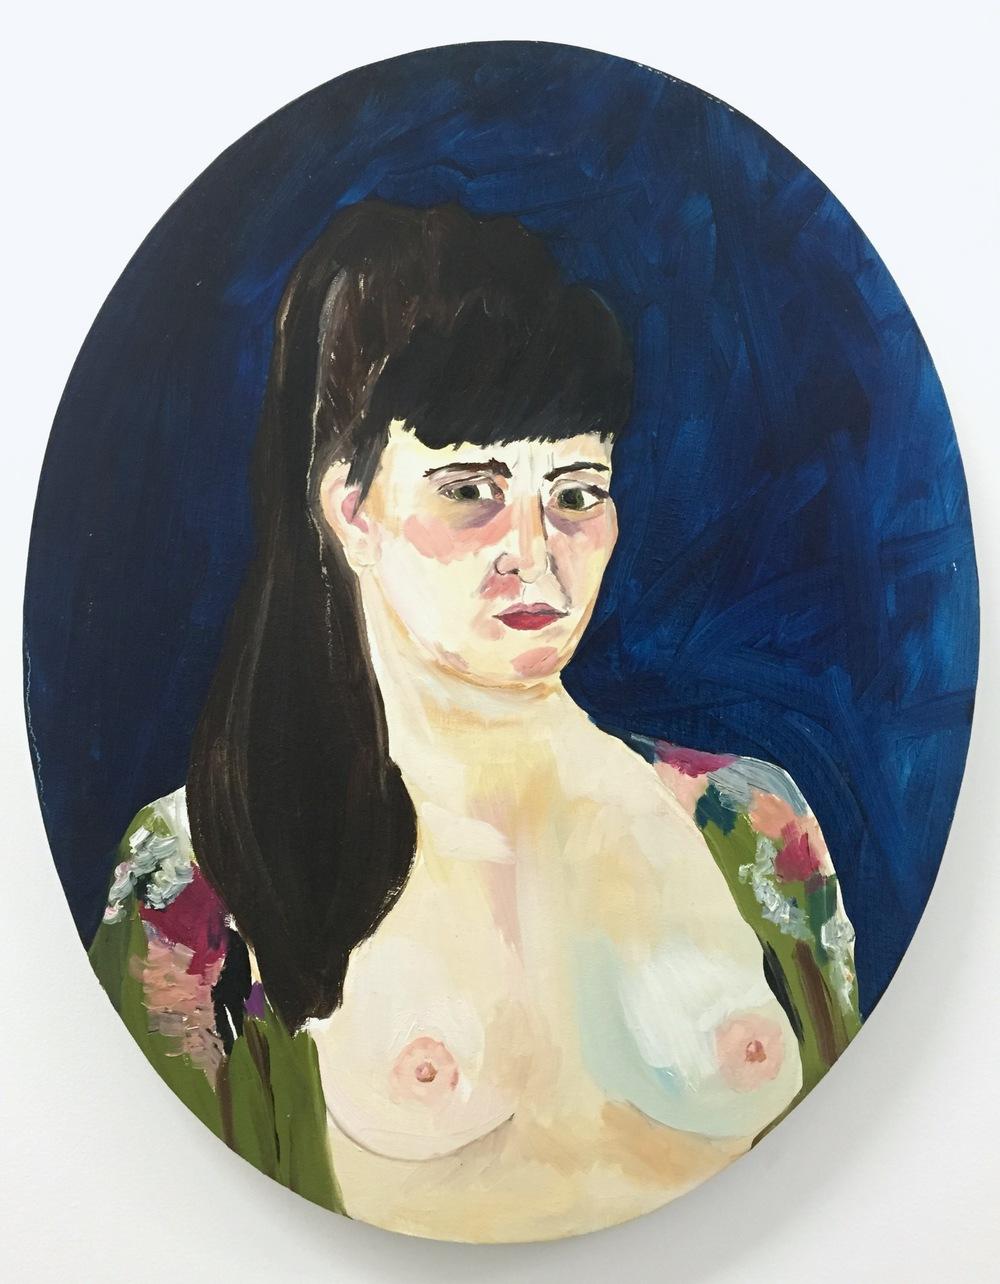 Lara Simms